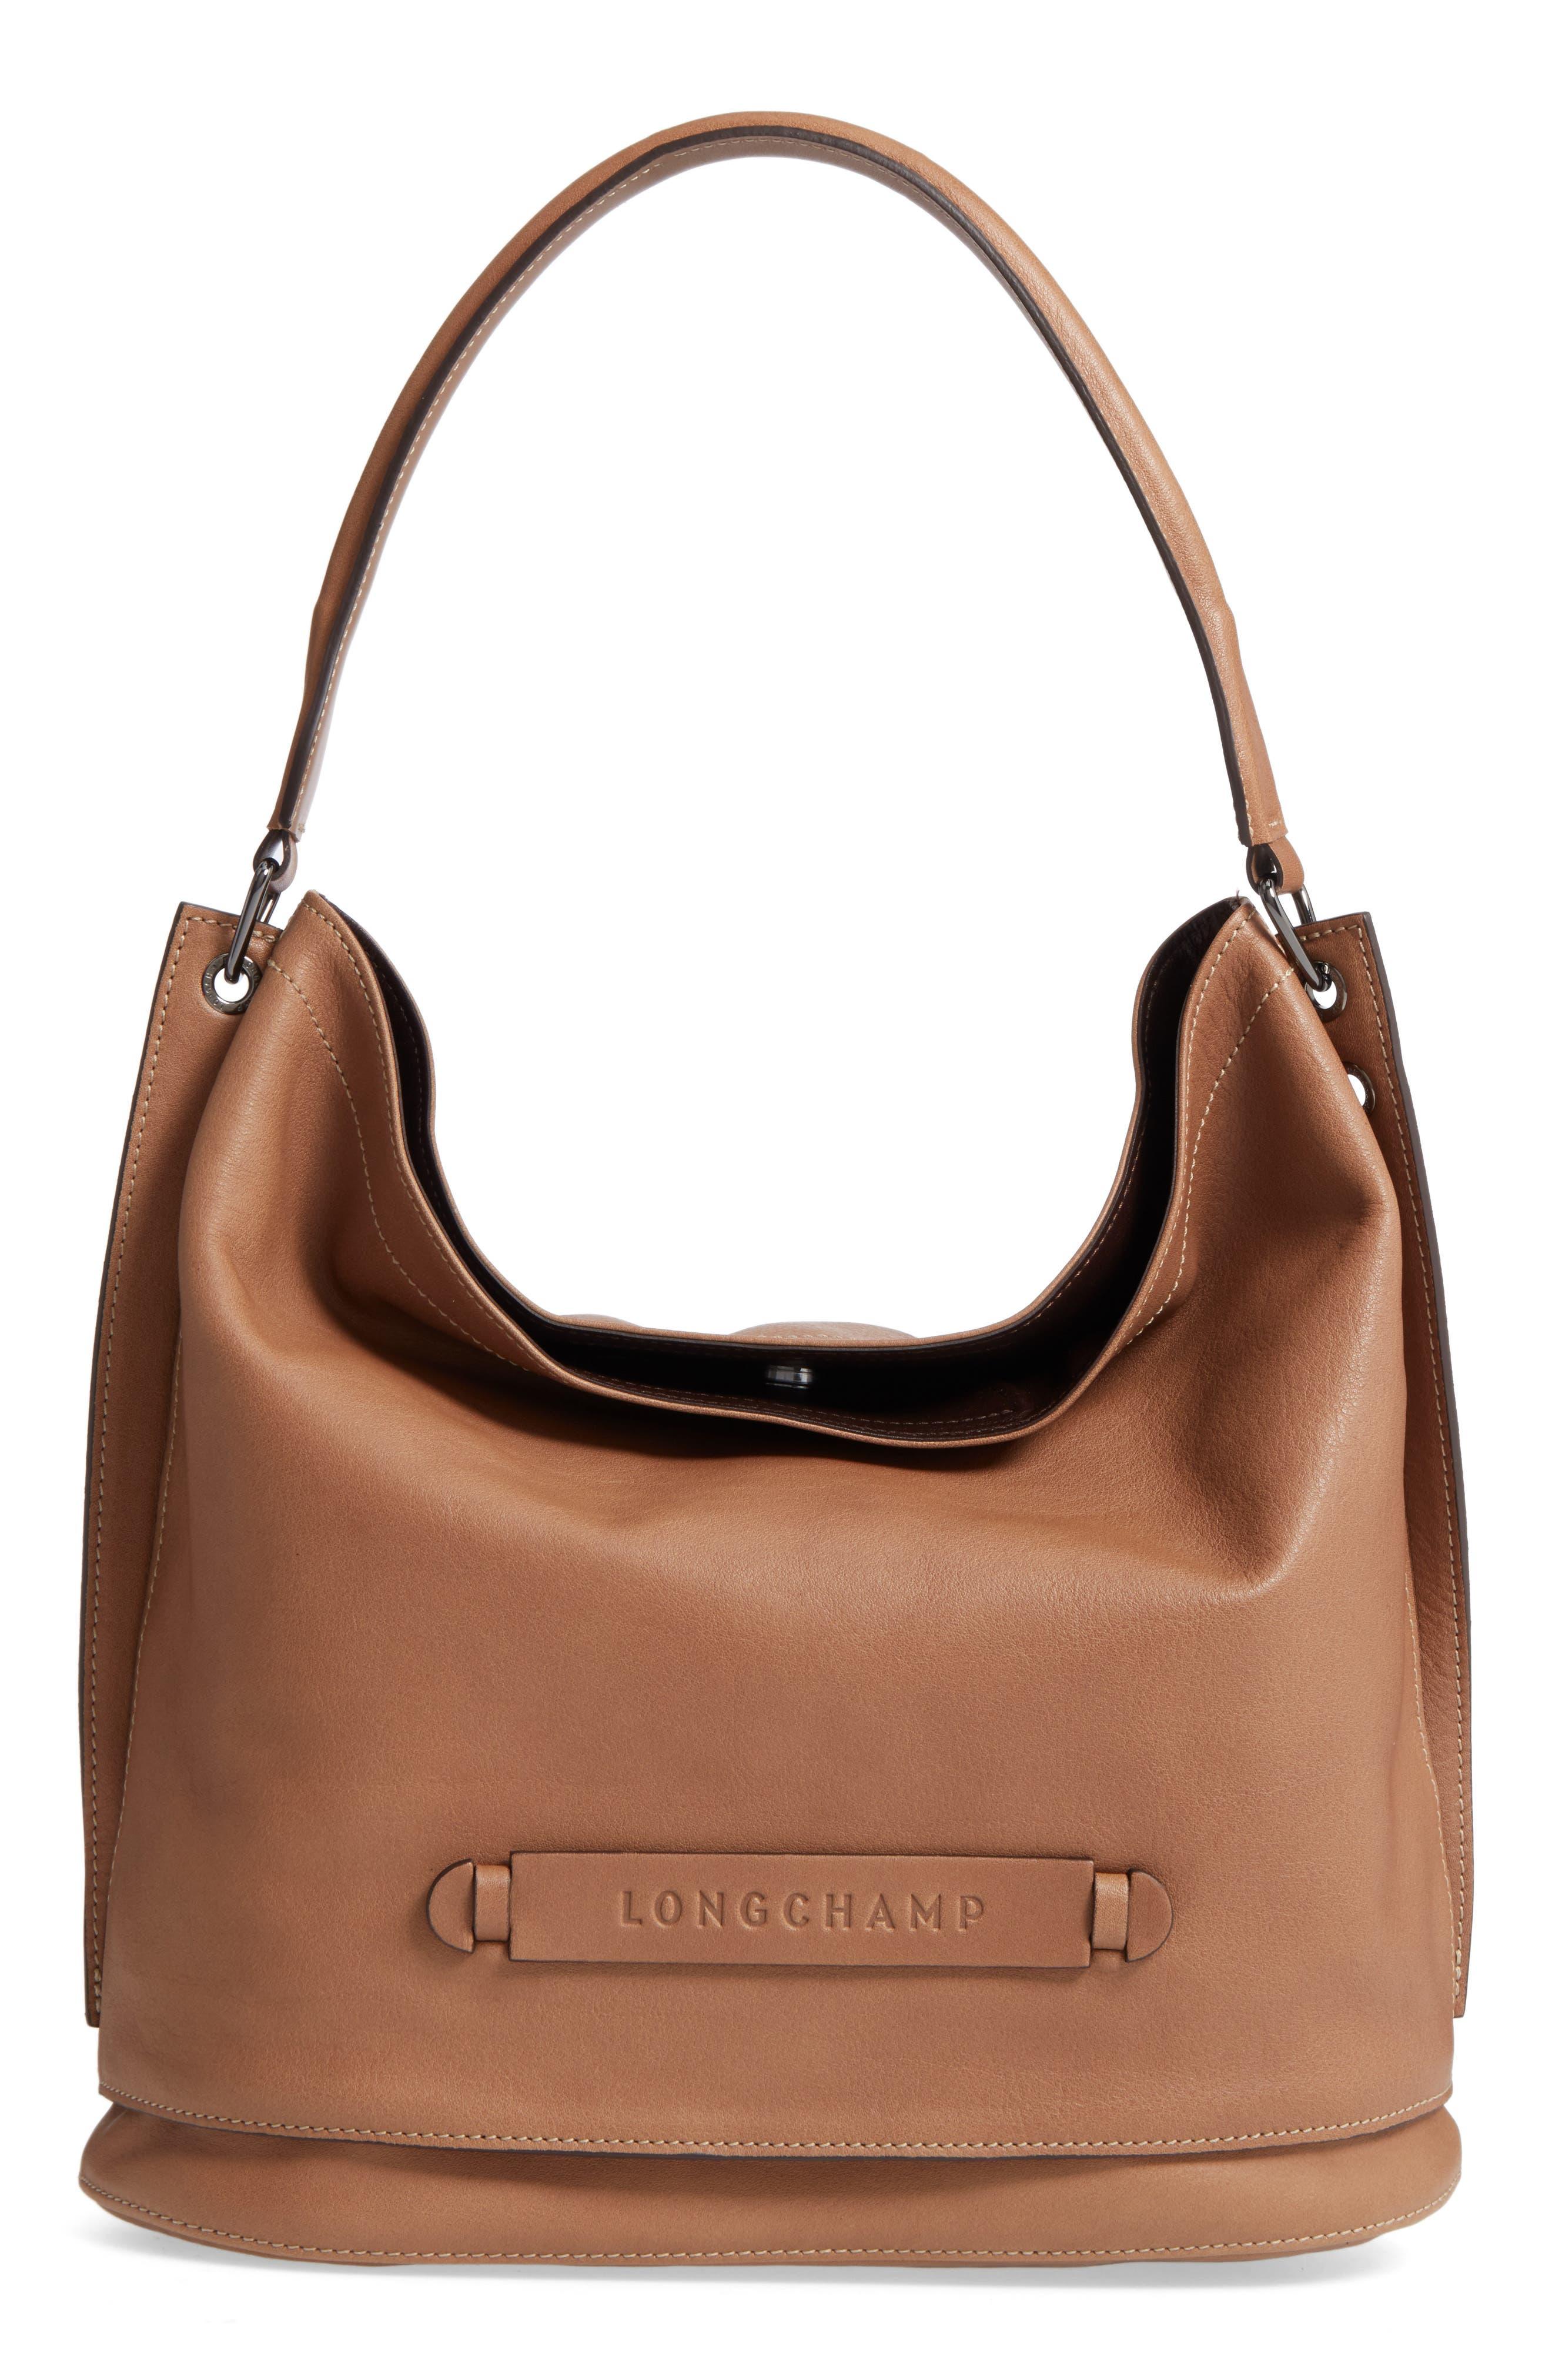 Longchamp '3D' Leather Hobo